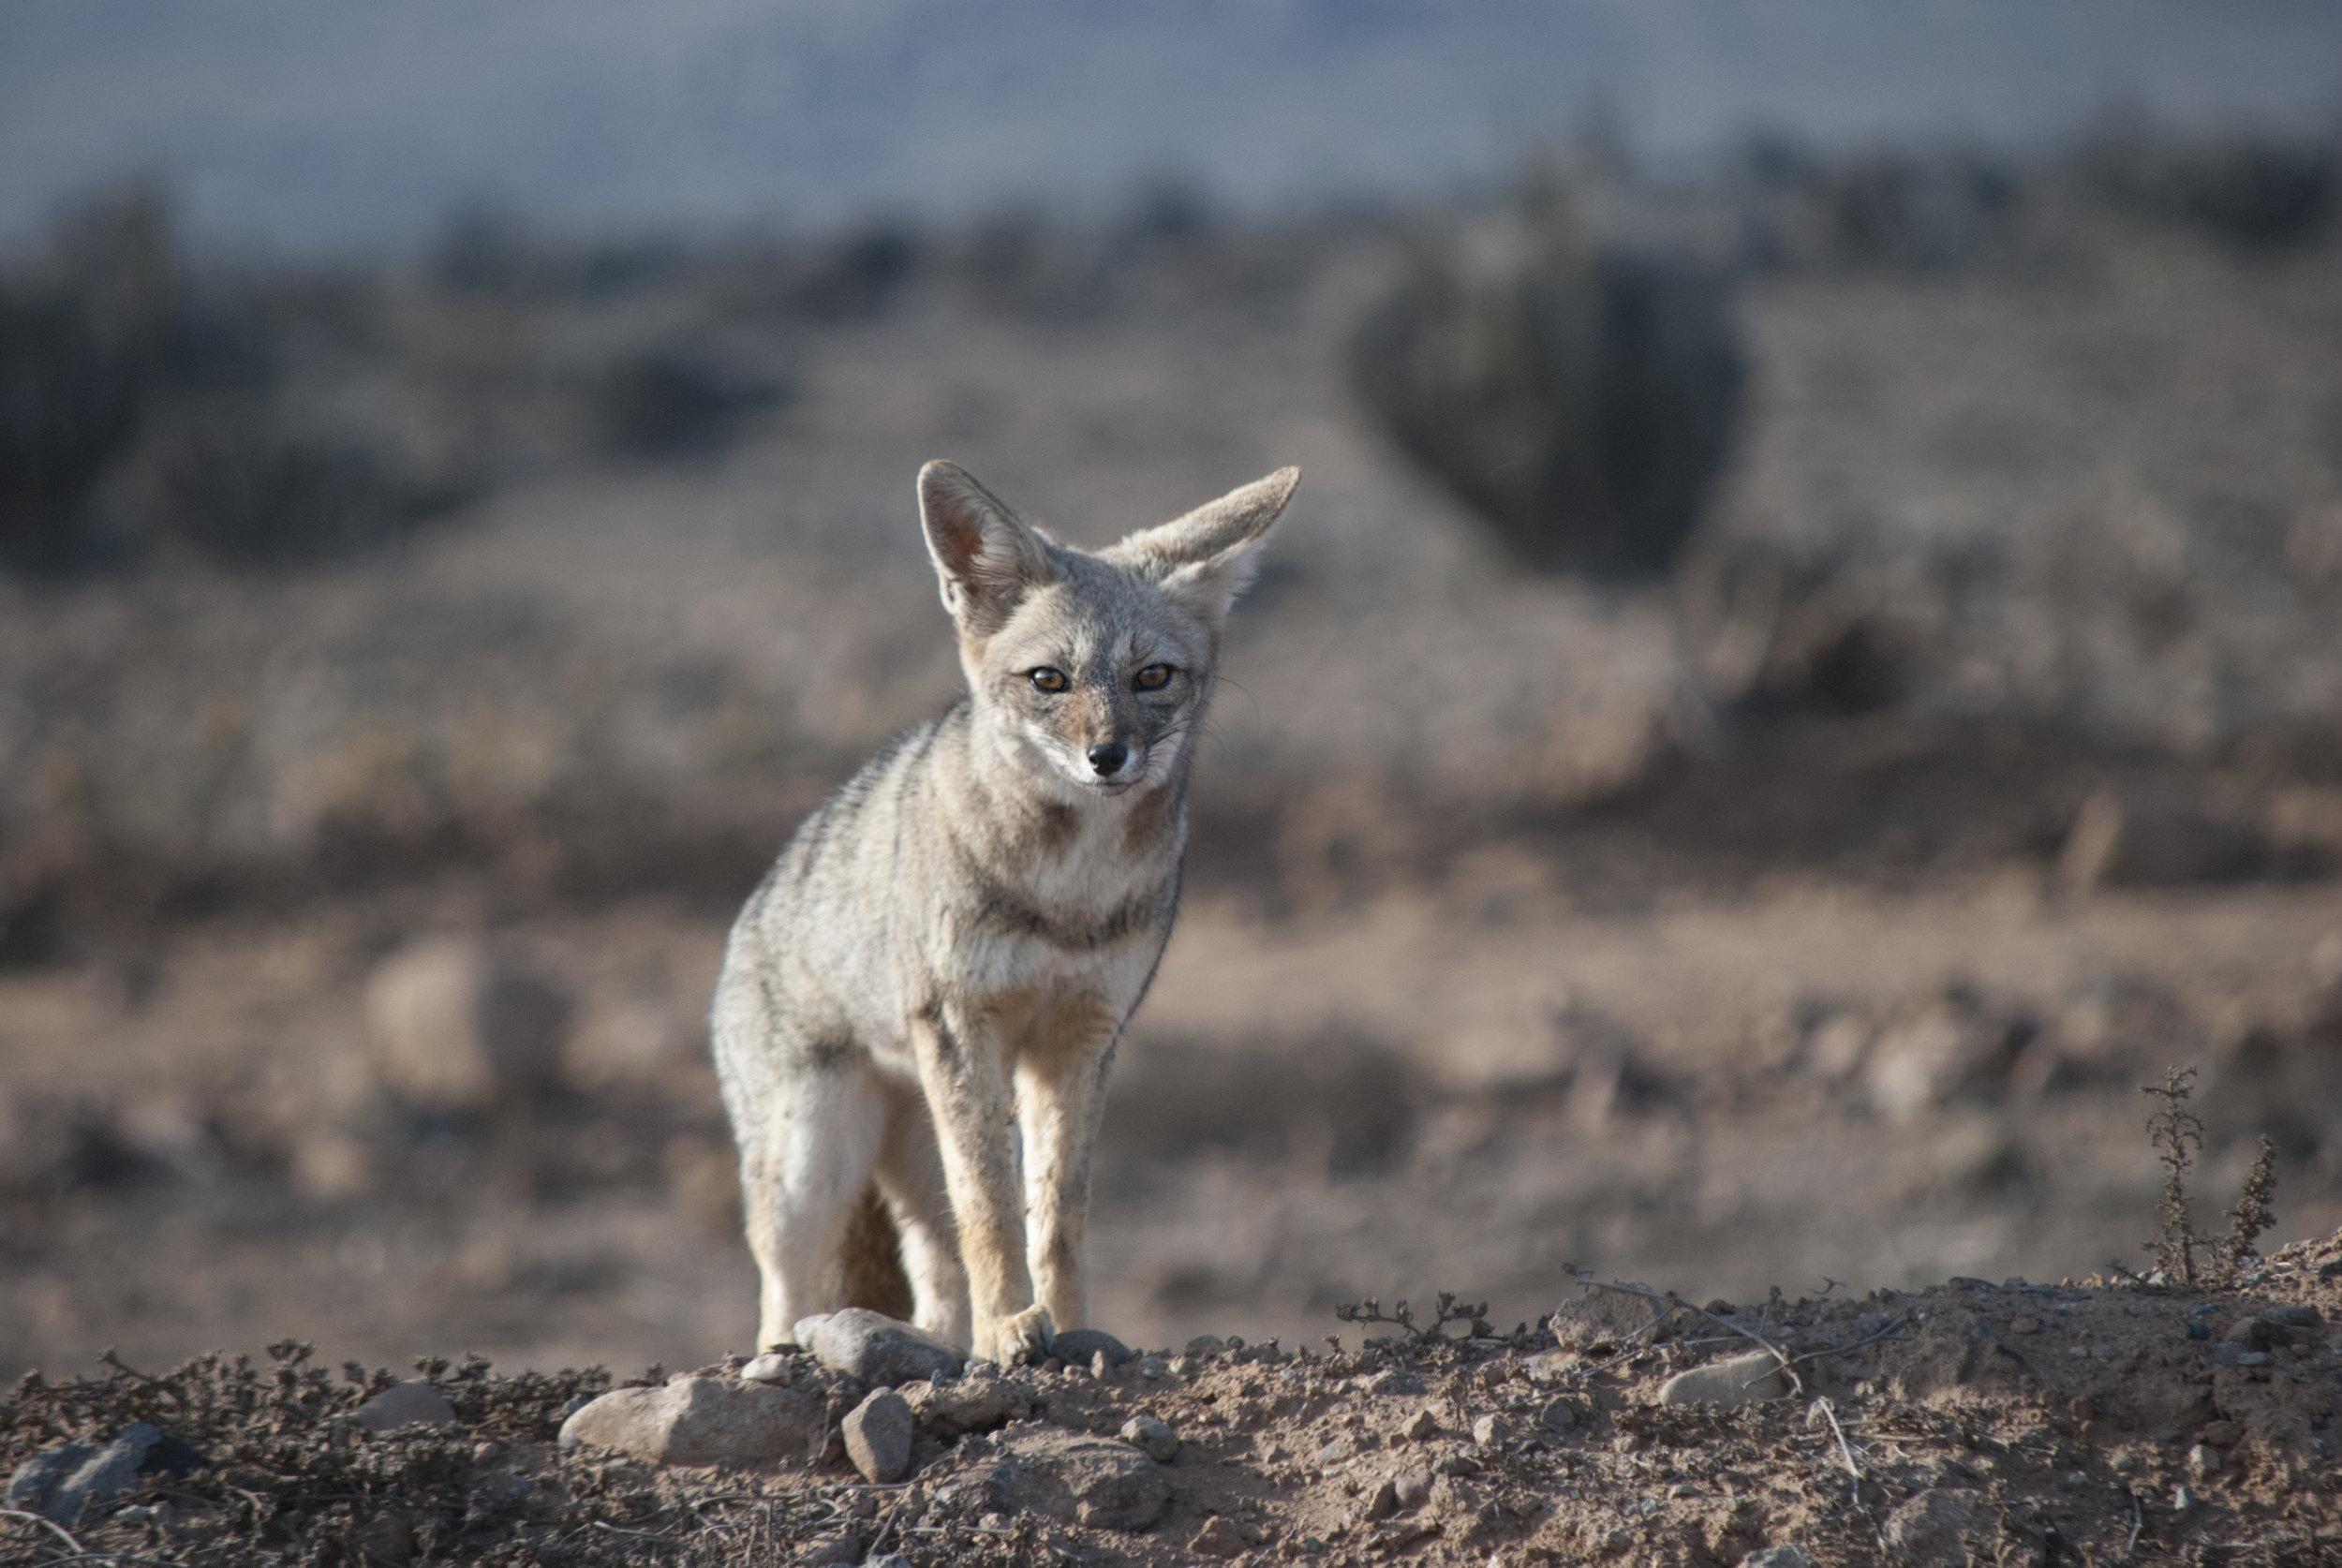 South American Gray Fox, Punta de Choros, Chile